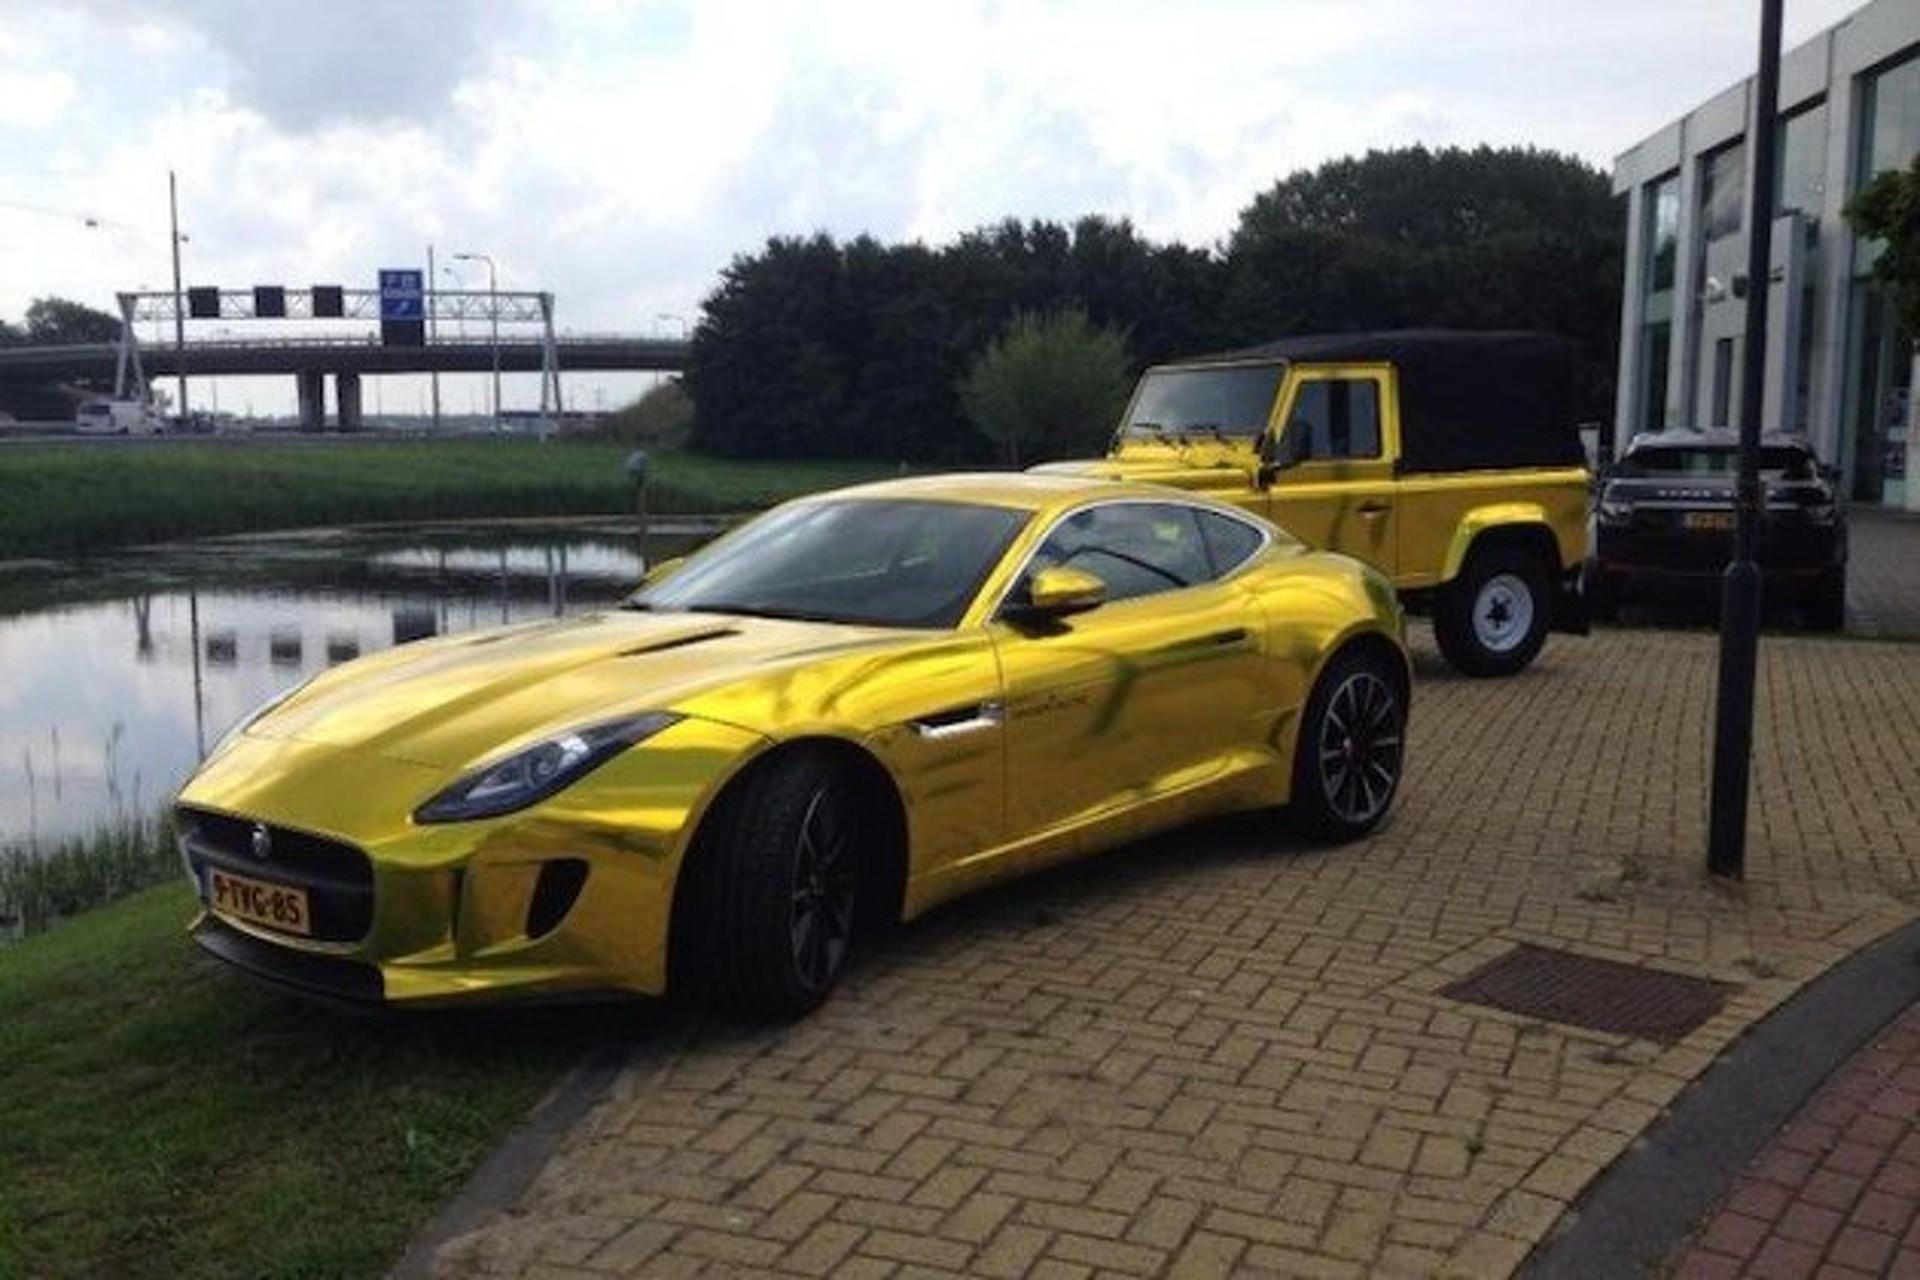 Terrible Gold Chrome Jaguar F Type Meets Terrible Gold Chrome Land